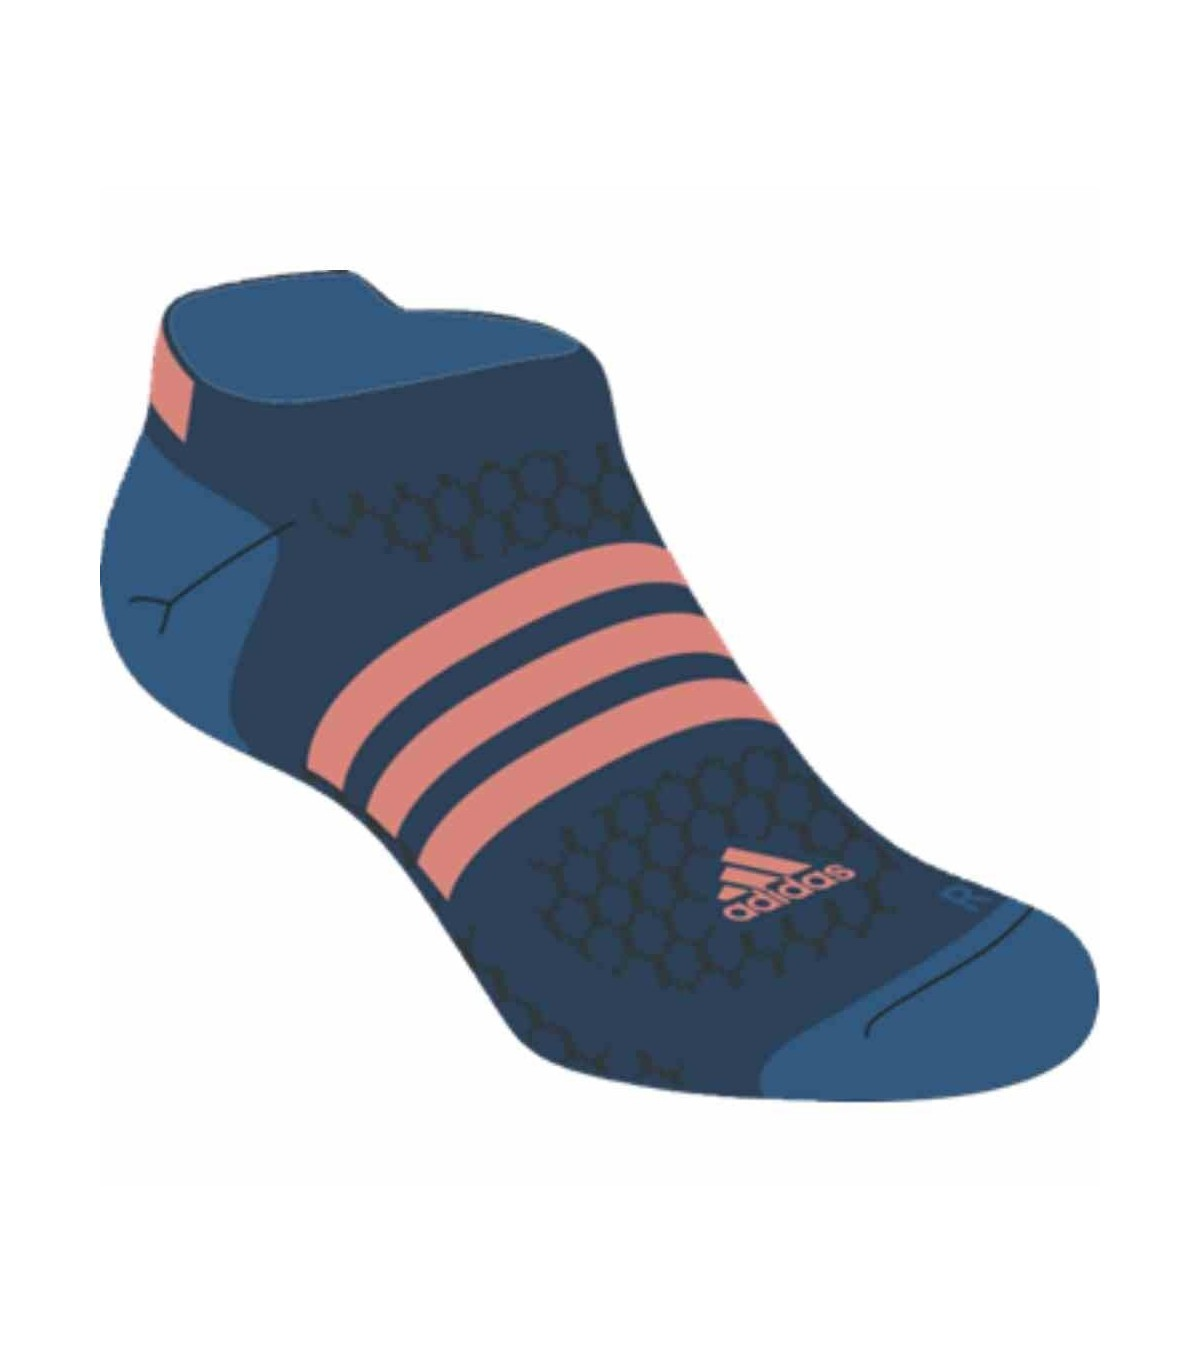 chaussettes de squash adidas id liner bleu fonc bleu rouge fluo. Black Bedroom Furniture Sets. Home Design Ideas